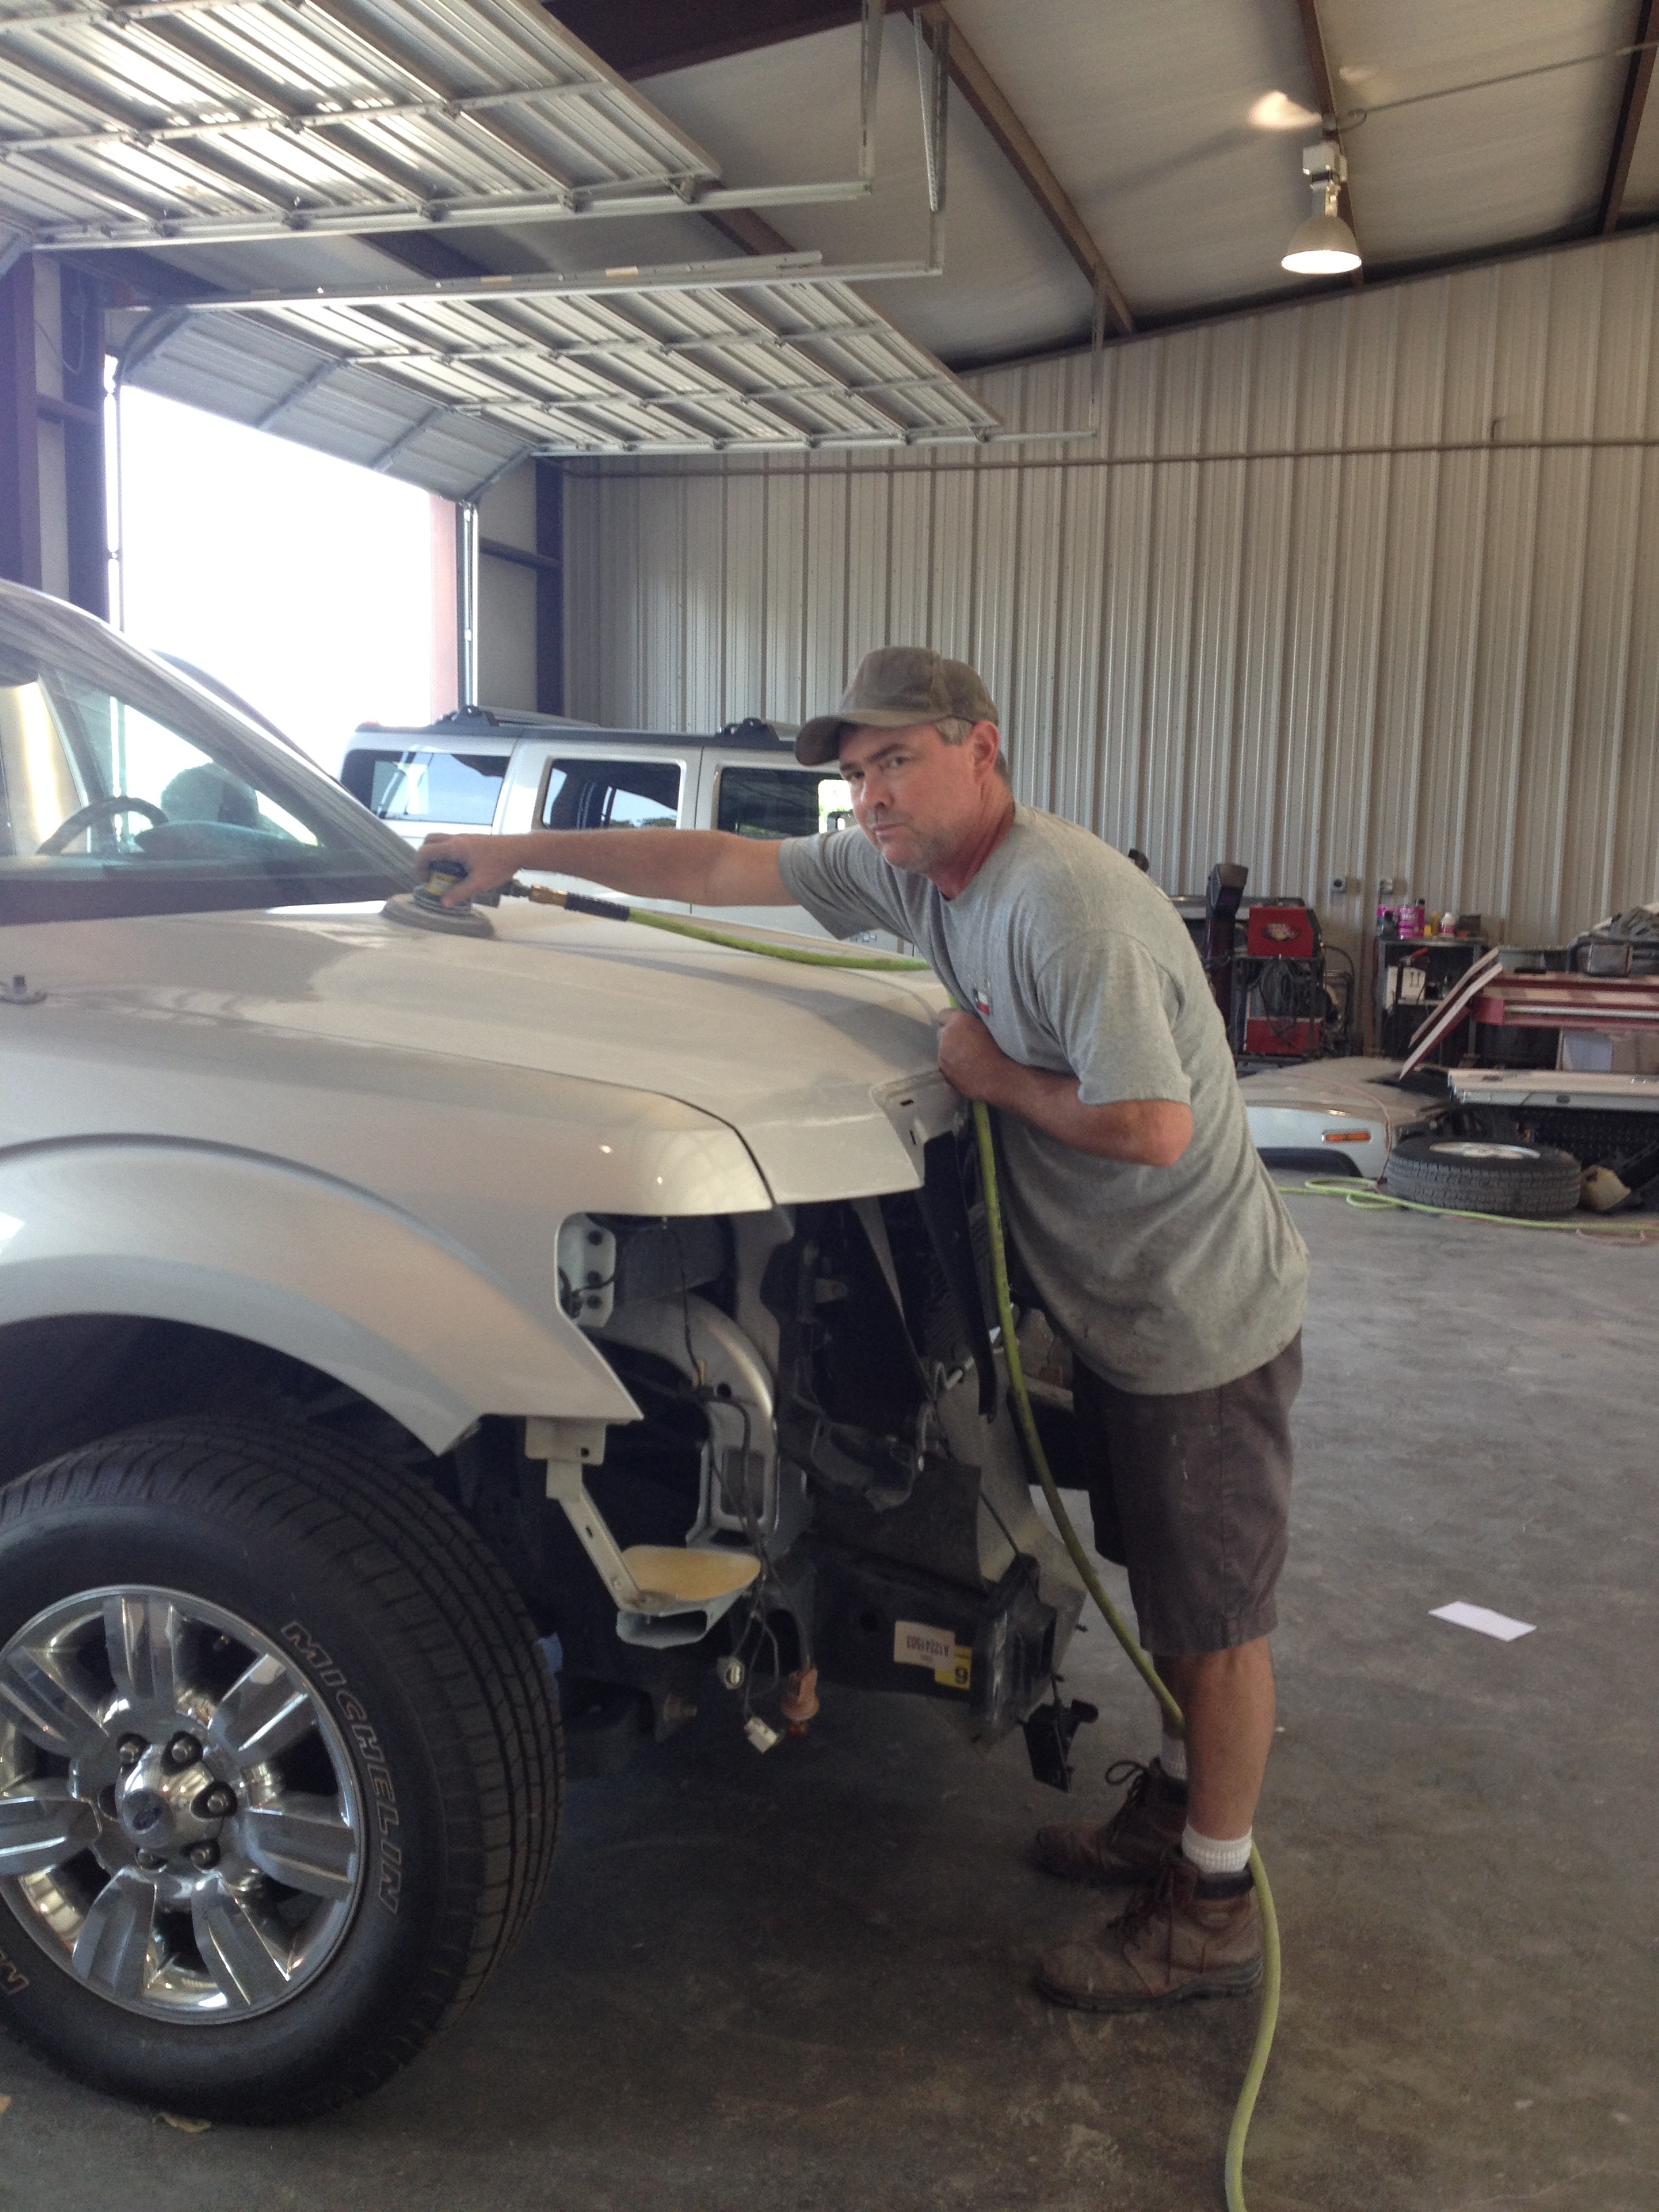 Autonation Ford Burleson >> S&A Collision, Burleson Texas (TX) - LocalDatabase.com